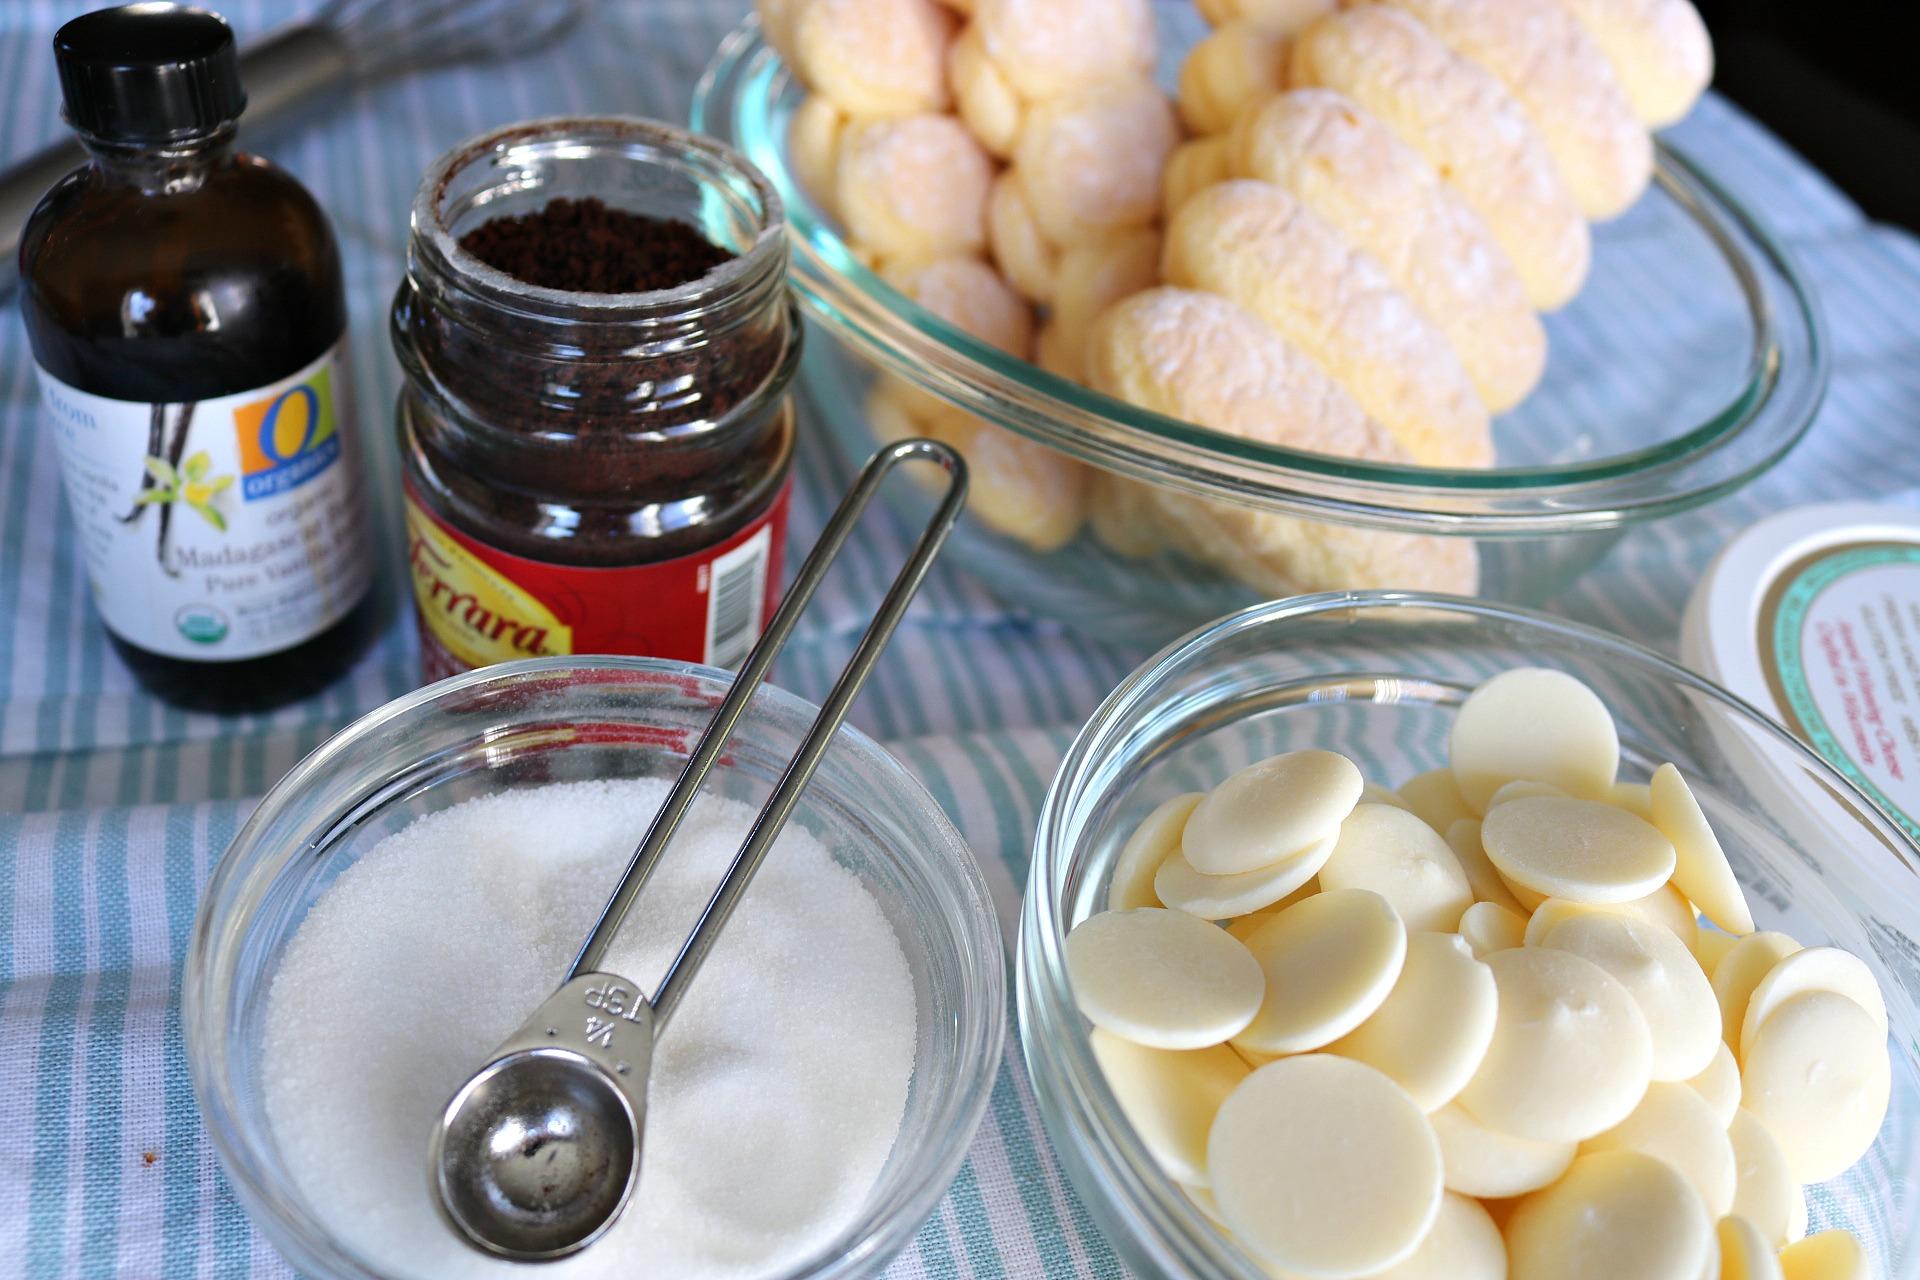 tiramisu, truffle, mascarpone, chocolate chips, vanilla, sugar, espresspo